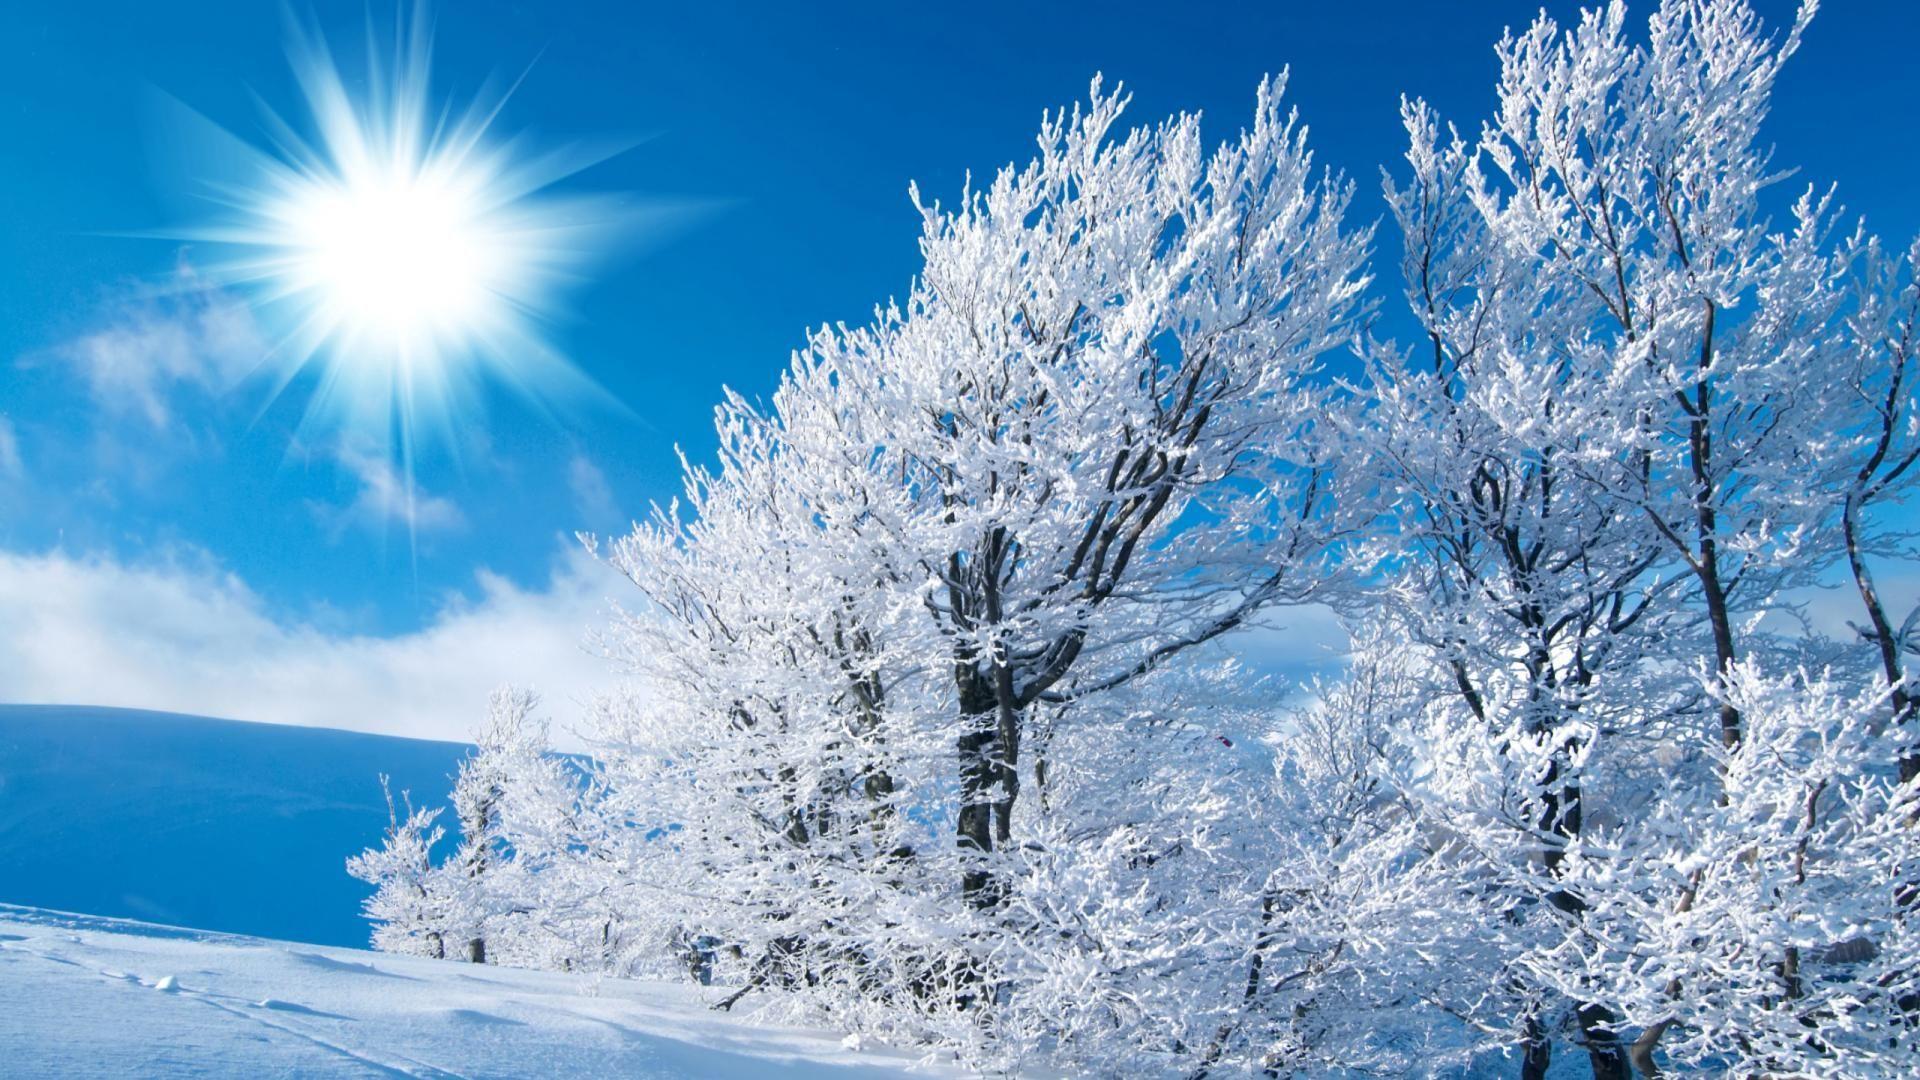 Winter Desktop Wallpapers Top Free Winter Desktop Backgrounds Wallpaperaccess